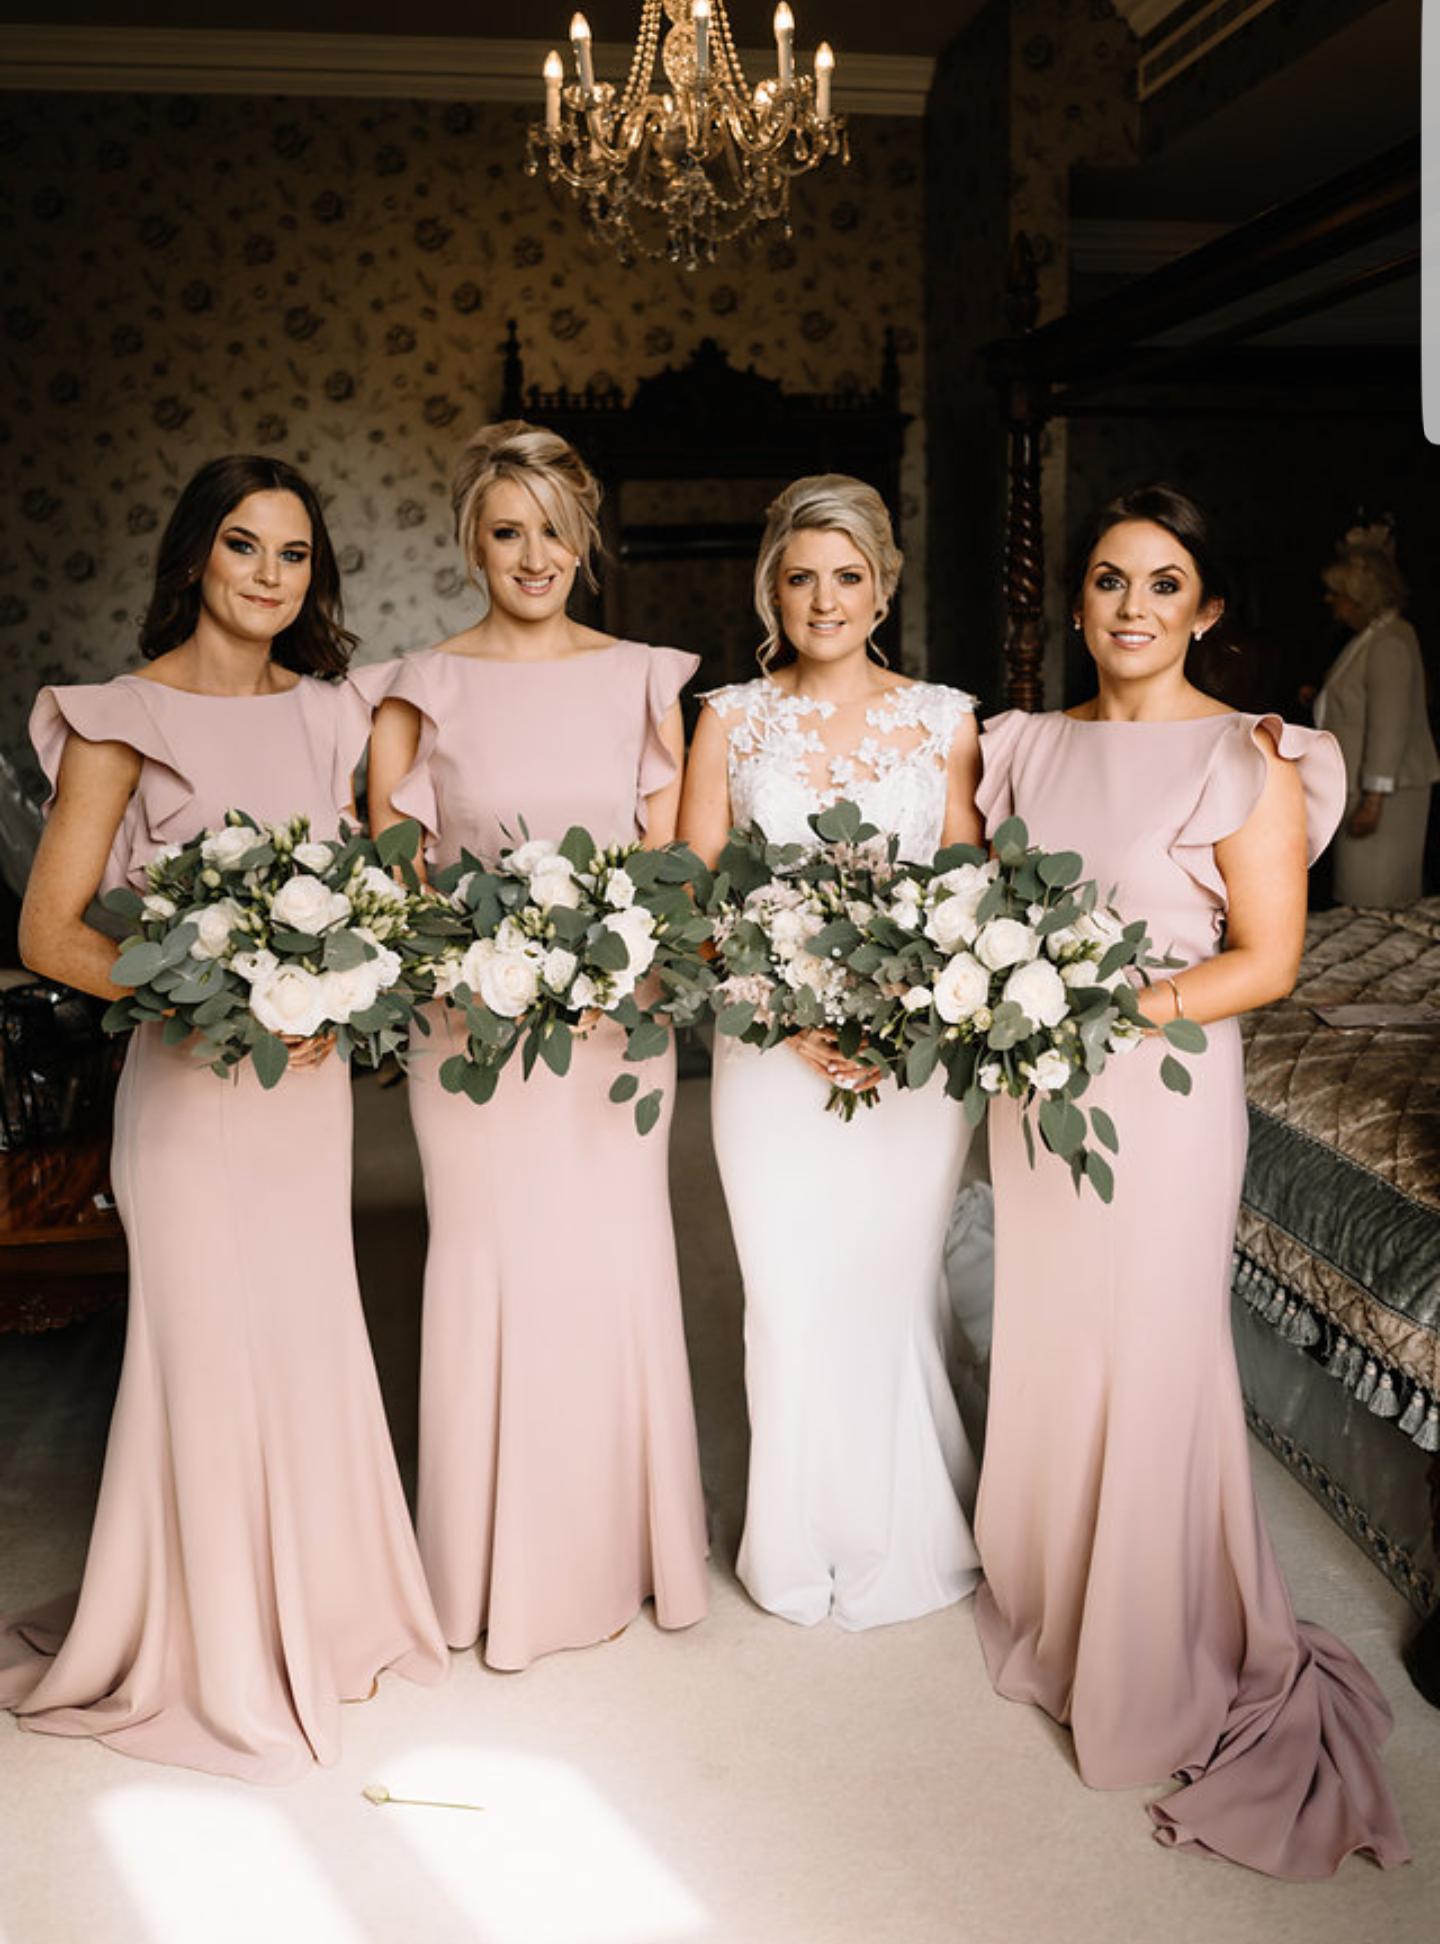 Edel's beautiful bridesmaids wearing  Cecelia in Smoked Blush  -  Photo Art Wedding Photography